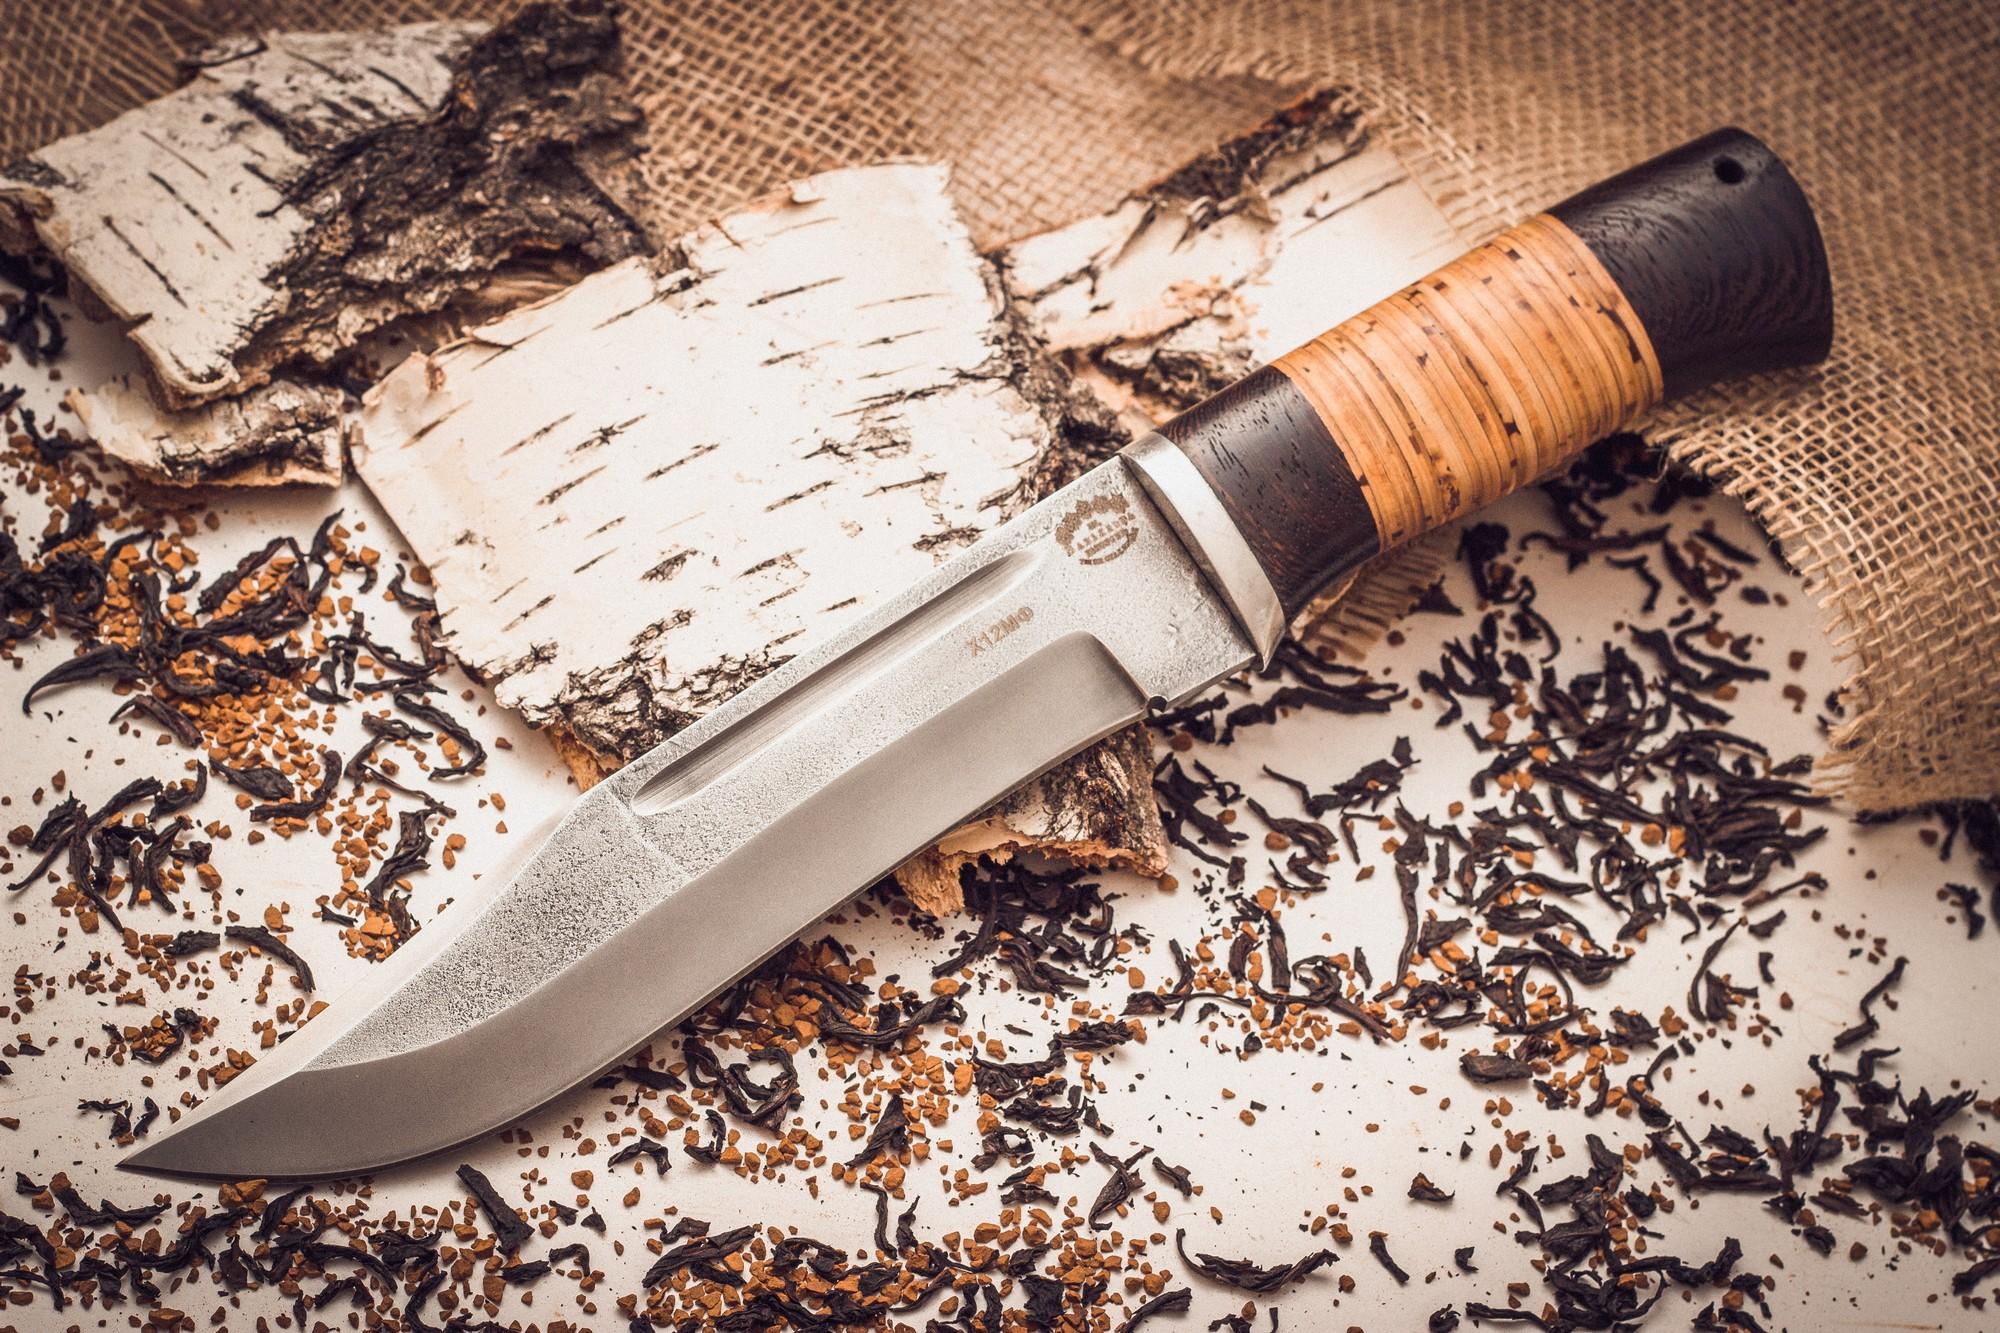 Нож Пустынный орел кованый Х12МФ, берестаНожи Ворсма<br><br>